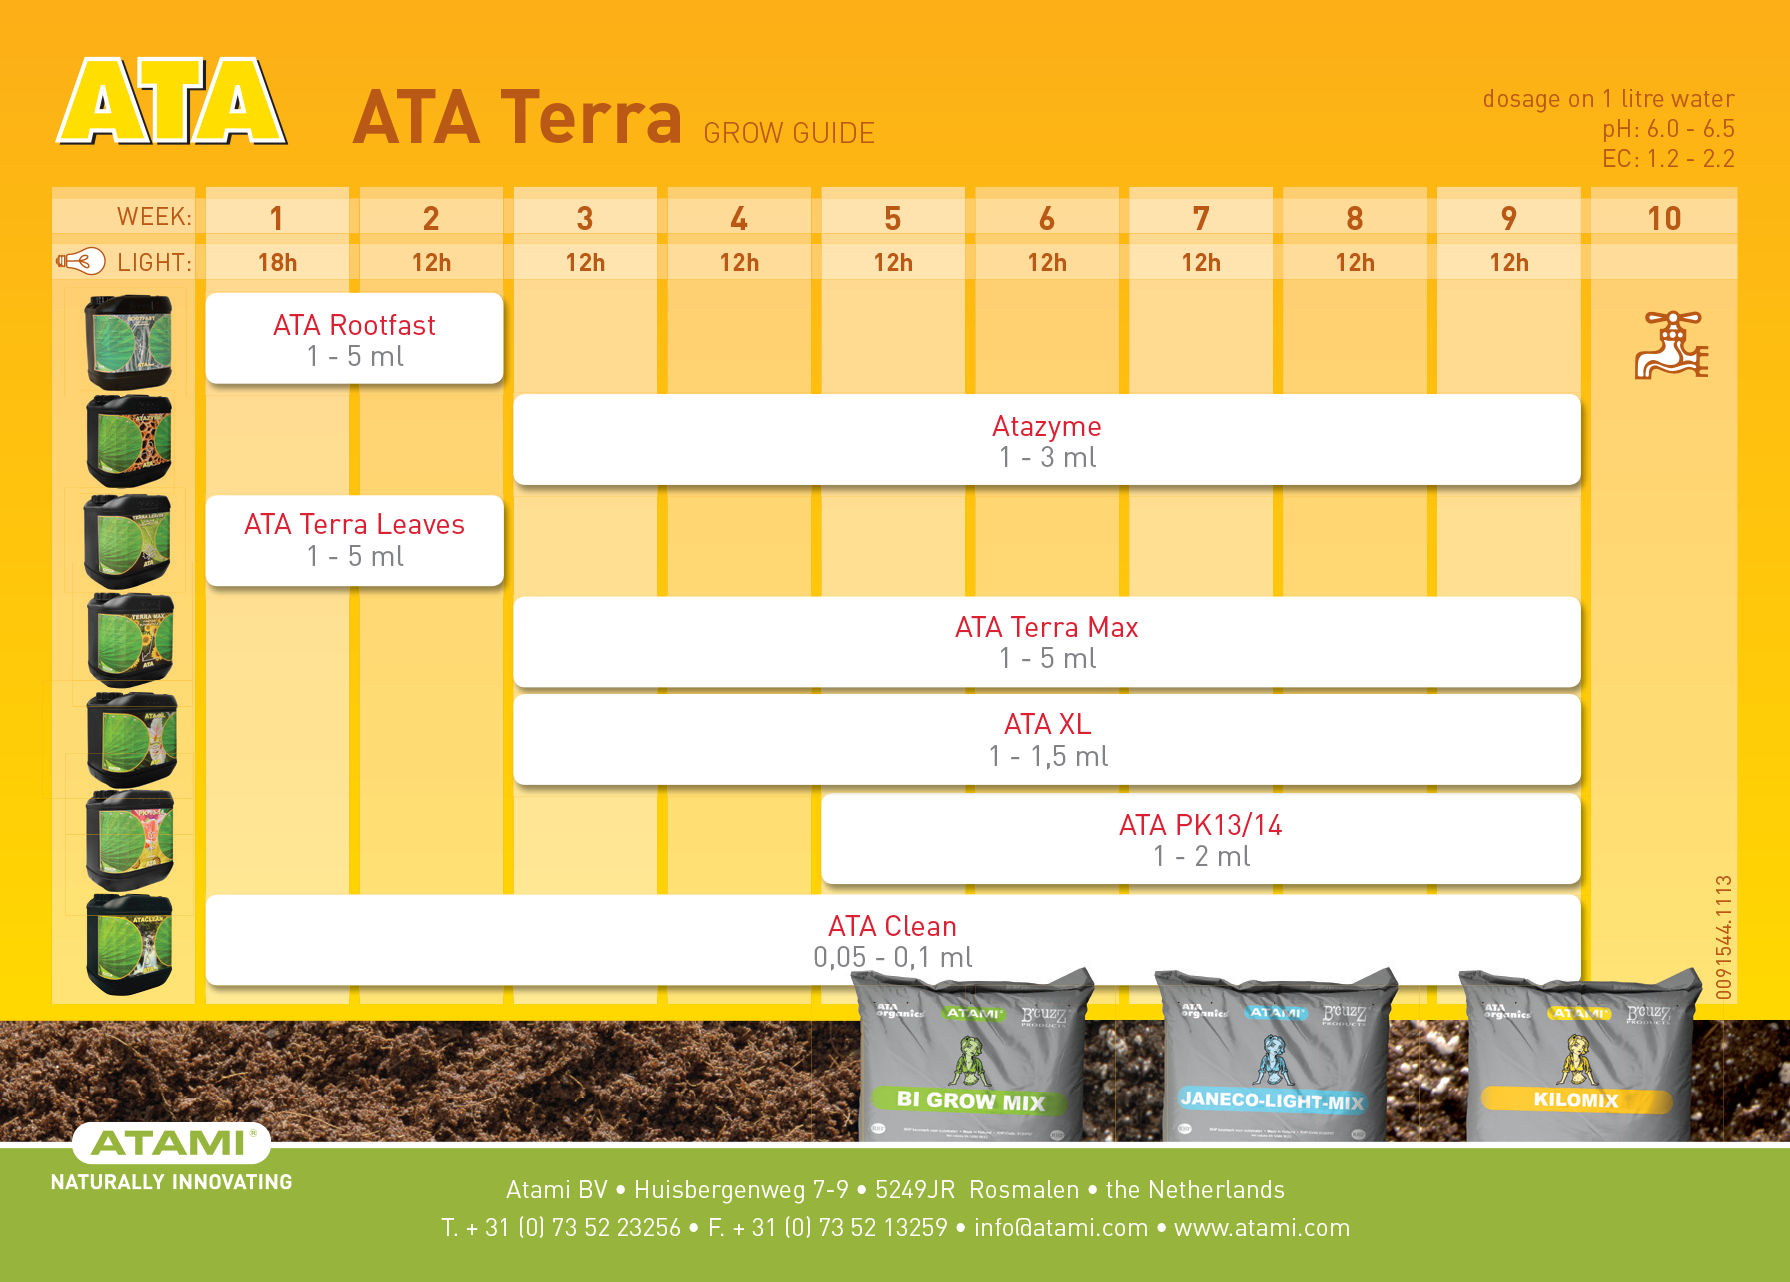 ATA Terra Leaves